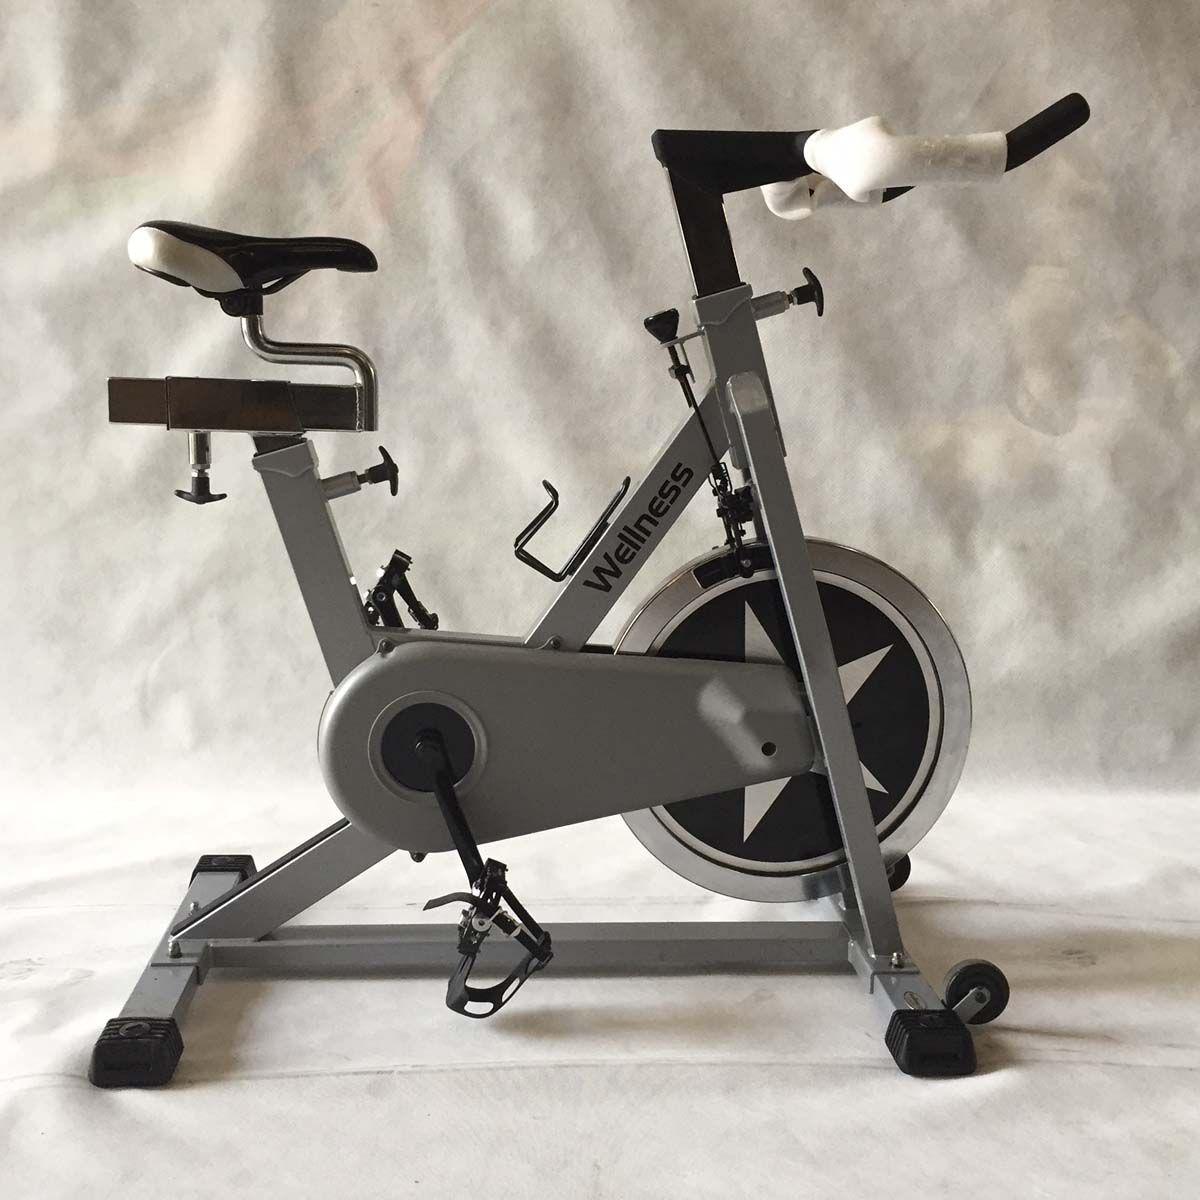 Bike Spinning Wellness Comp Peça Showroom Com Roda Preta